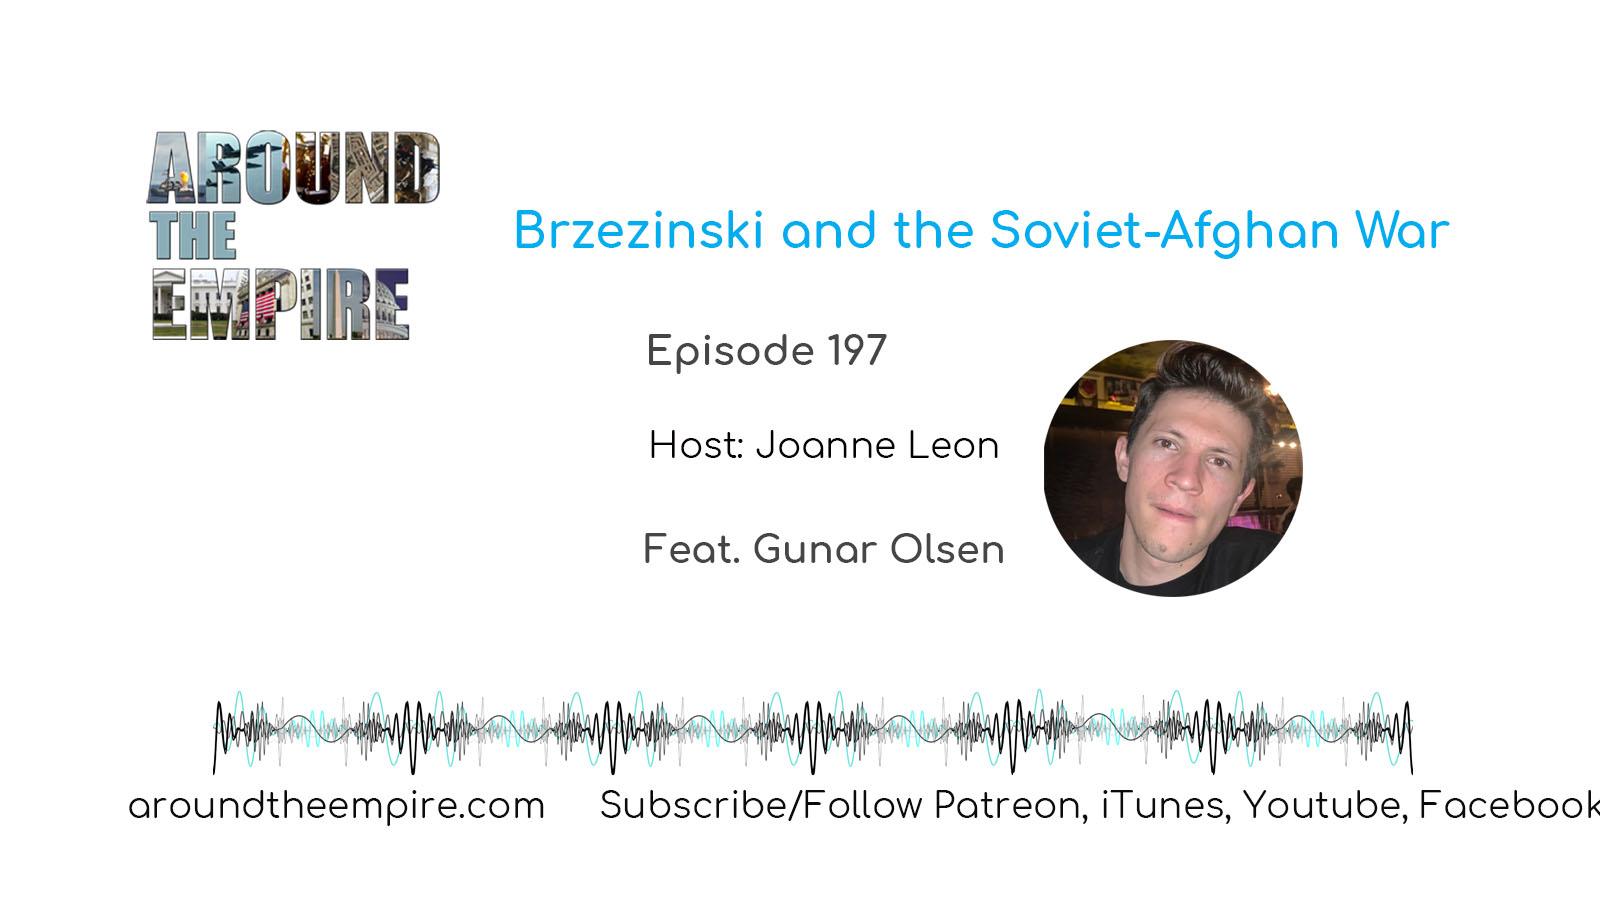 Ep 197 Brzezinski and the Soviet-Afghan War feat Gunar Olsen